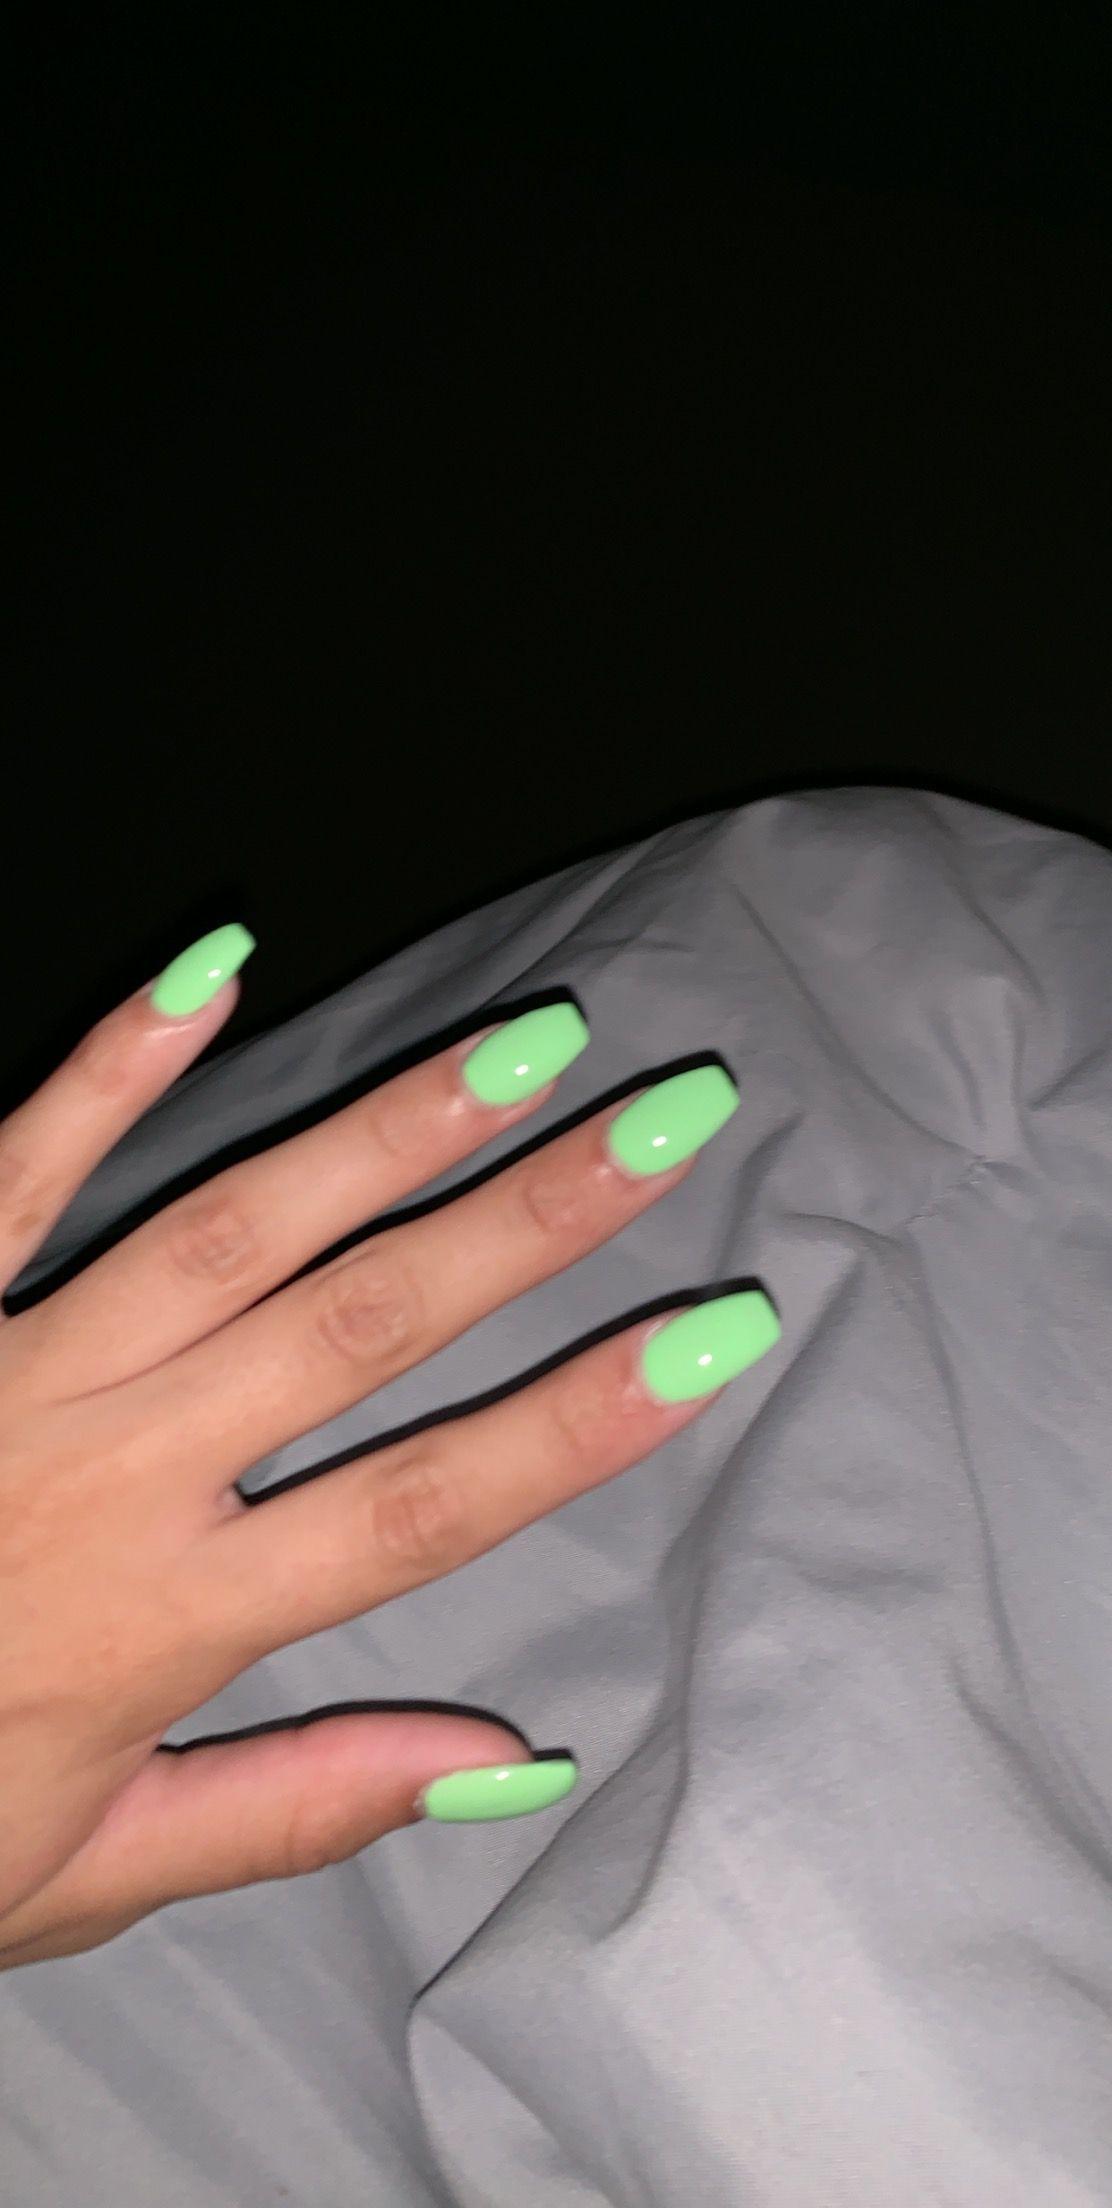 Nails Aesthetic acrylic nails (2020) Neon green nails